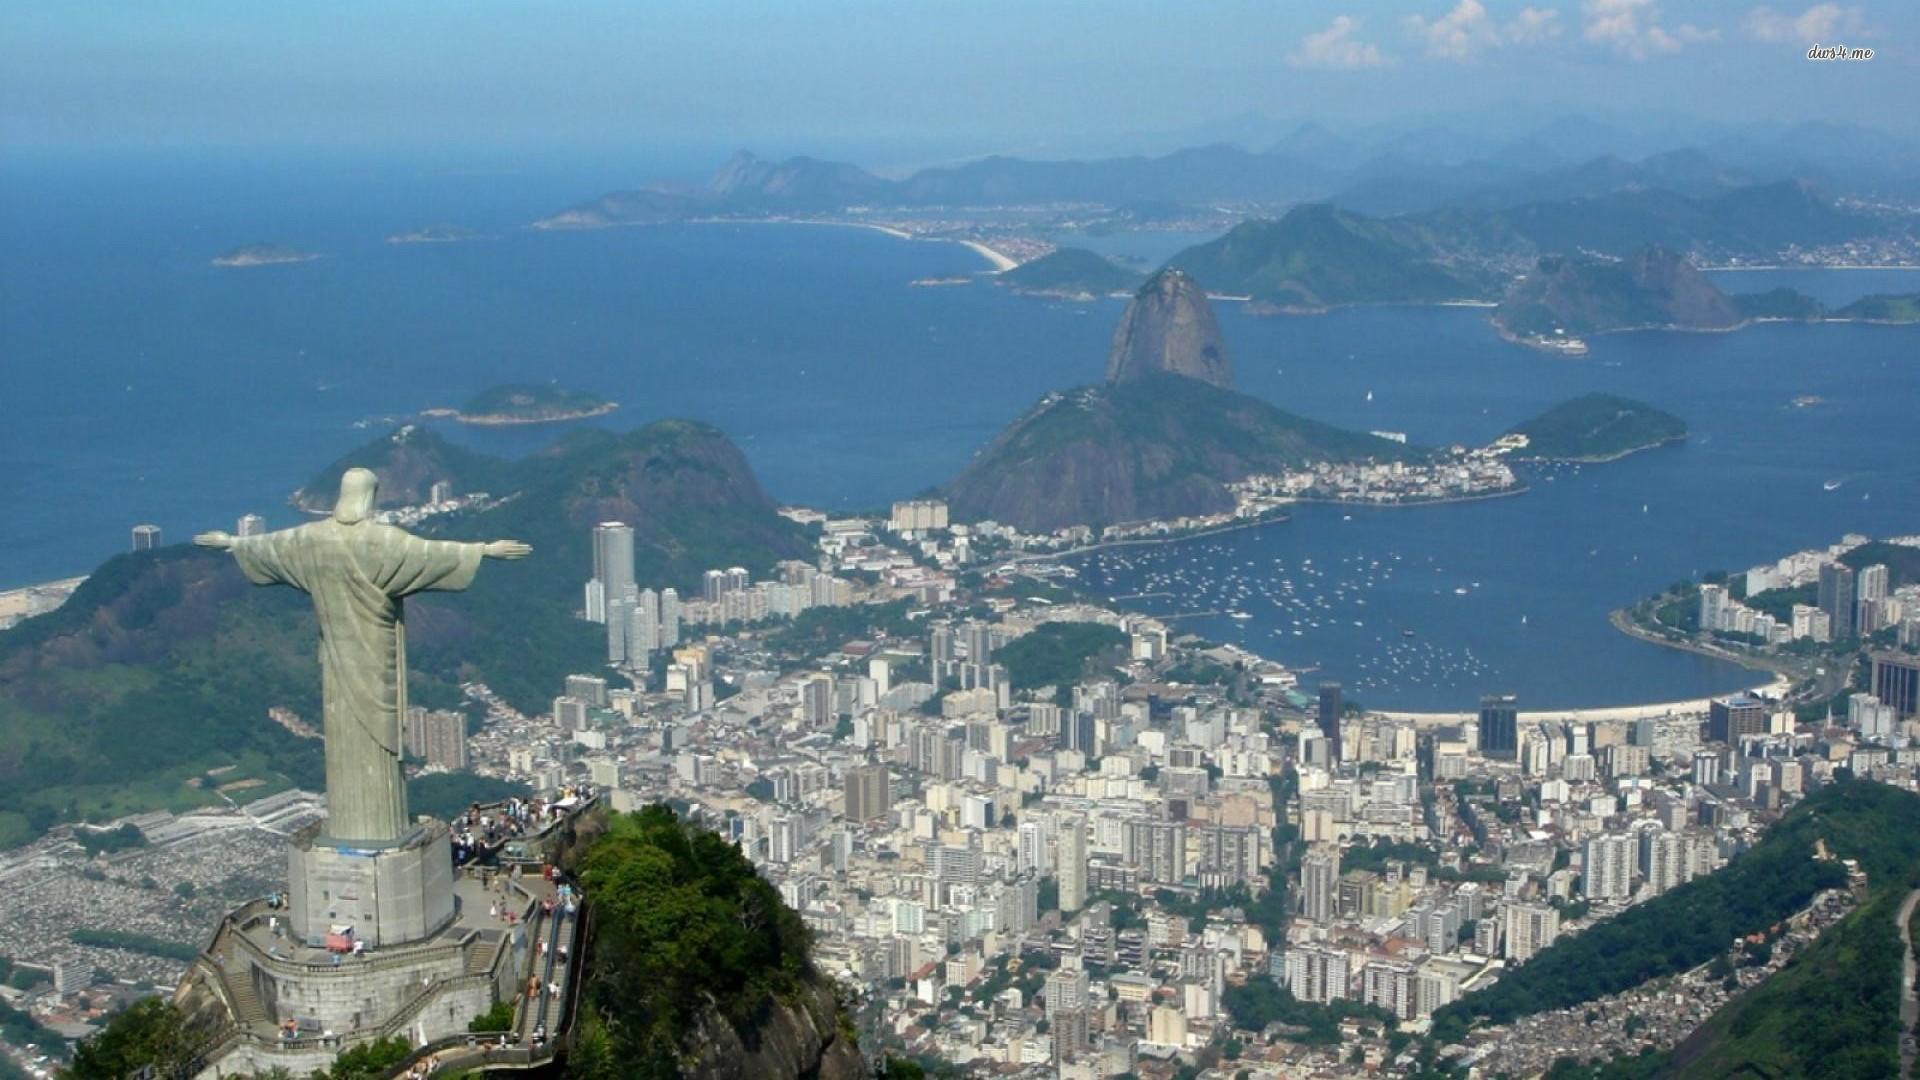 Statue of Jesus Rio de Janeiro wallpaper 1920x1080 1920x1080